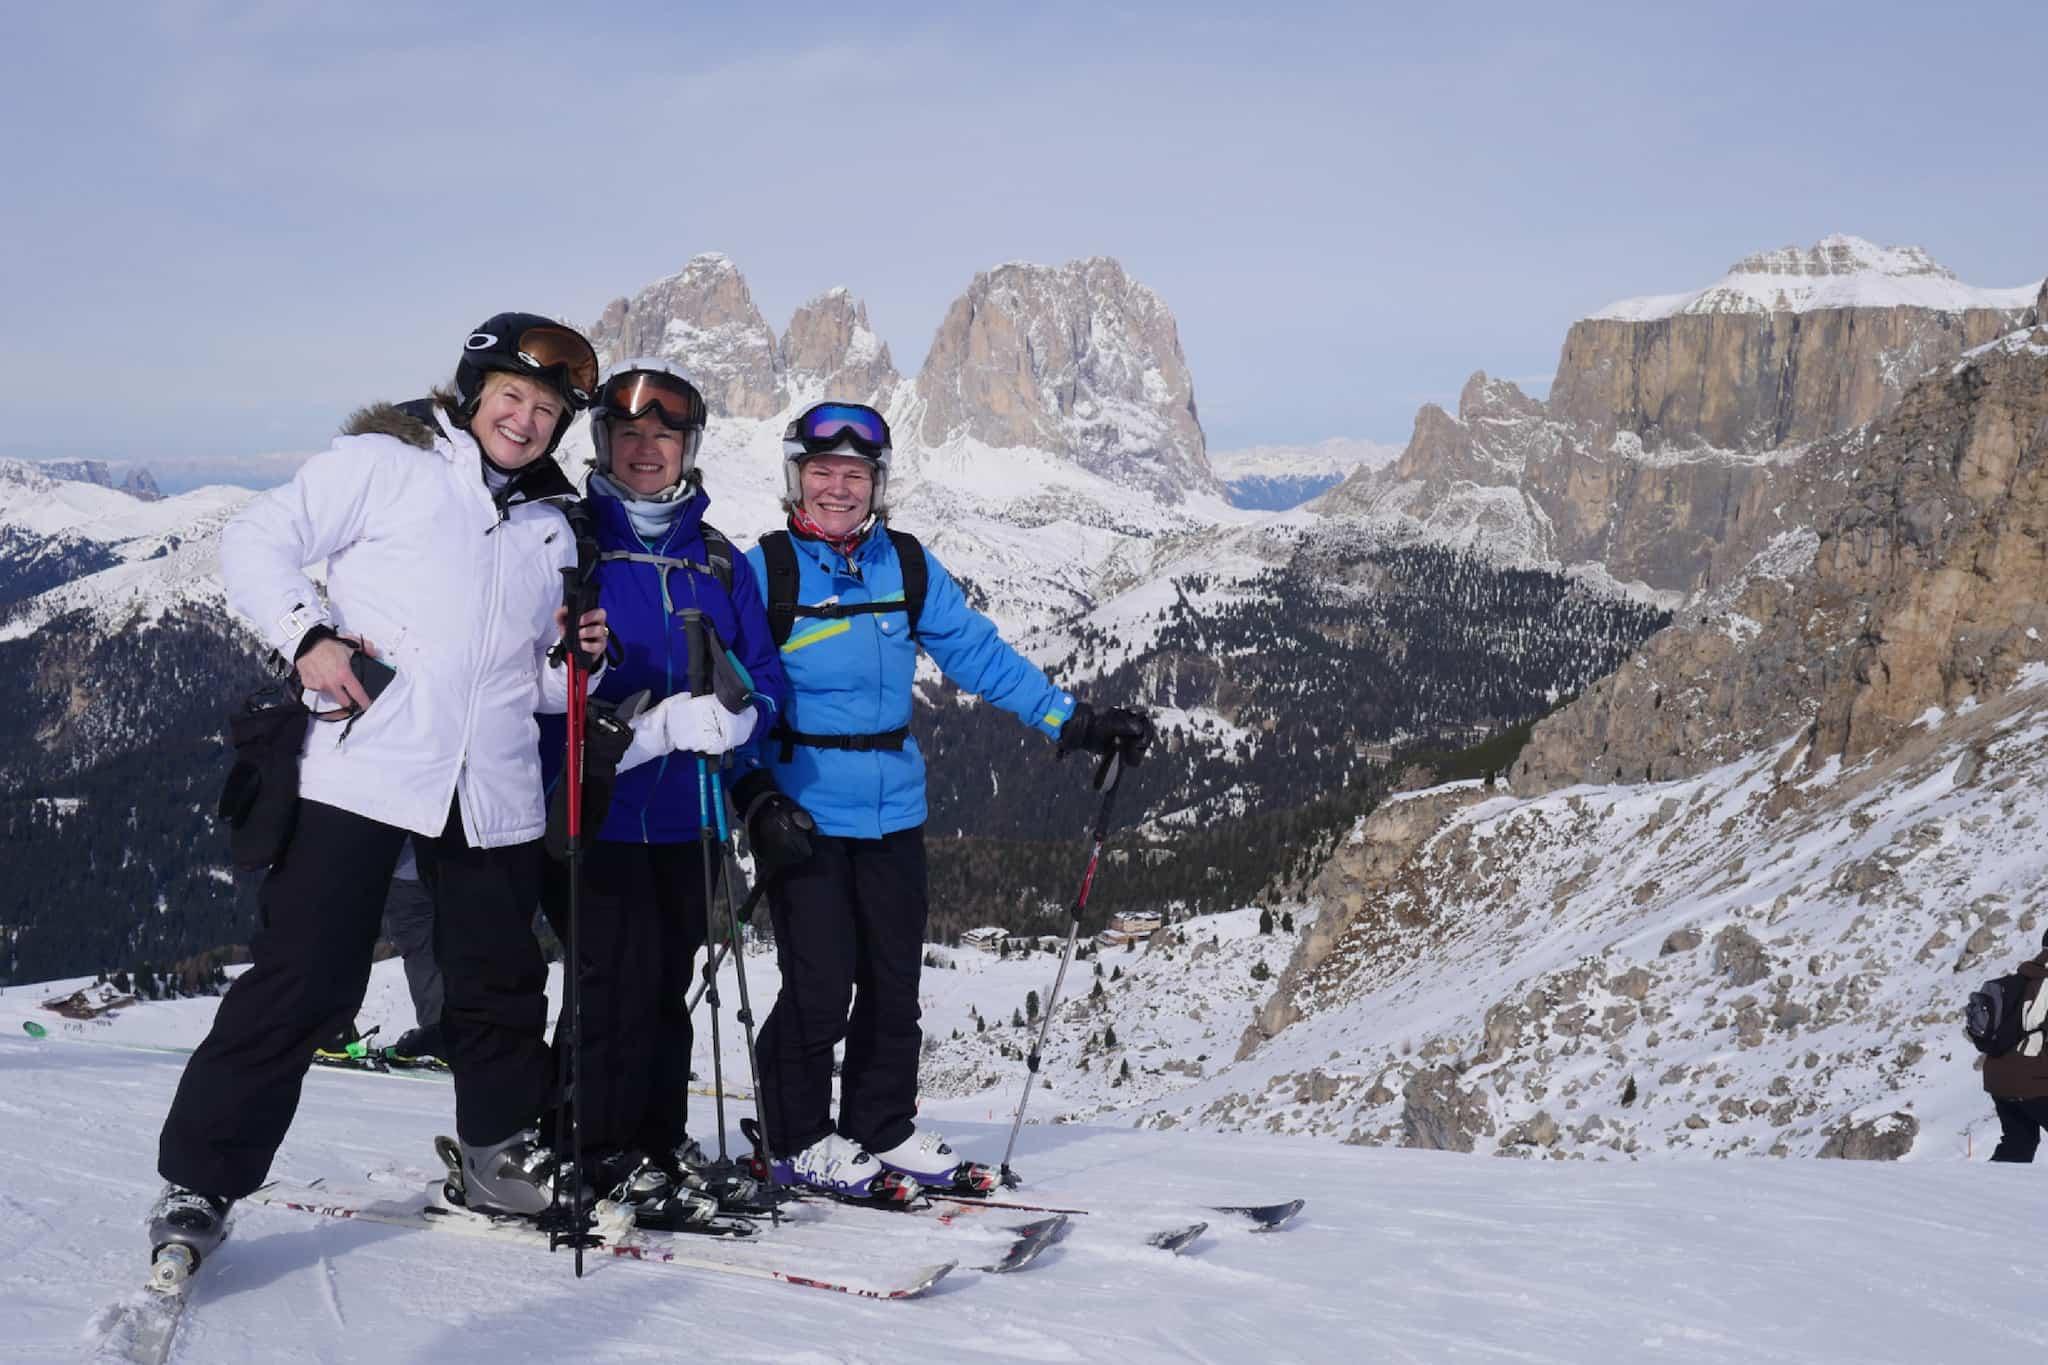 Ski Holidays in Switzerland